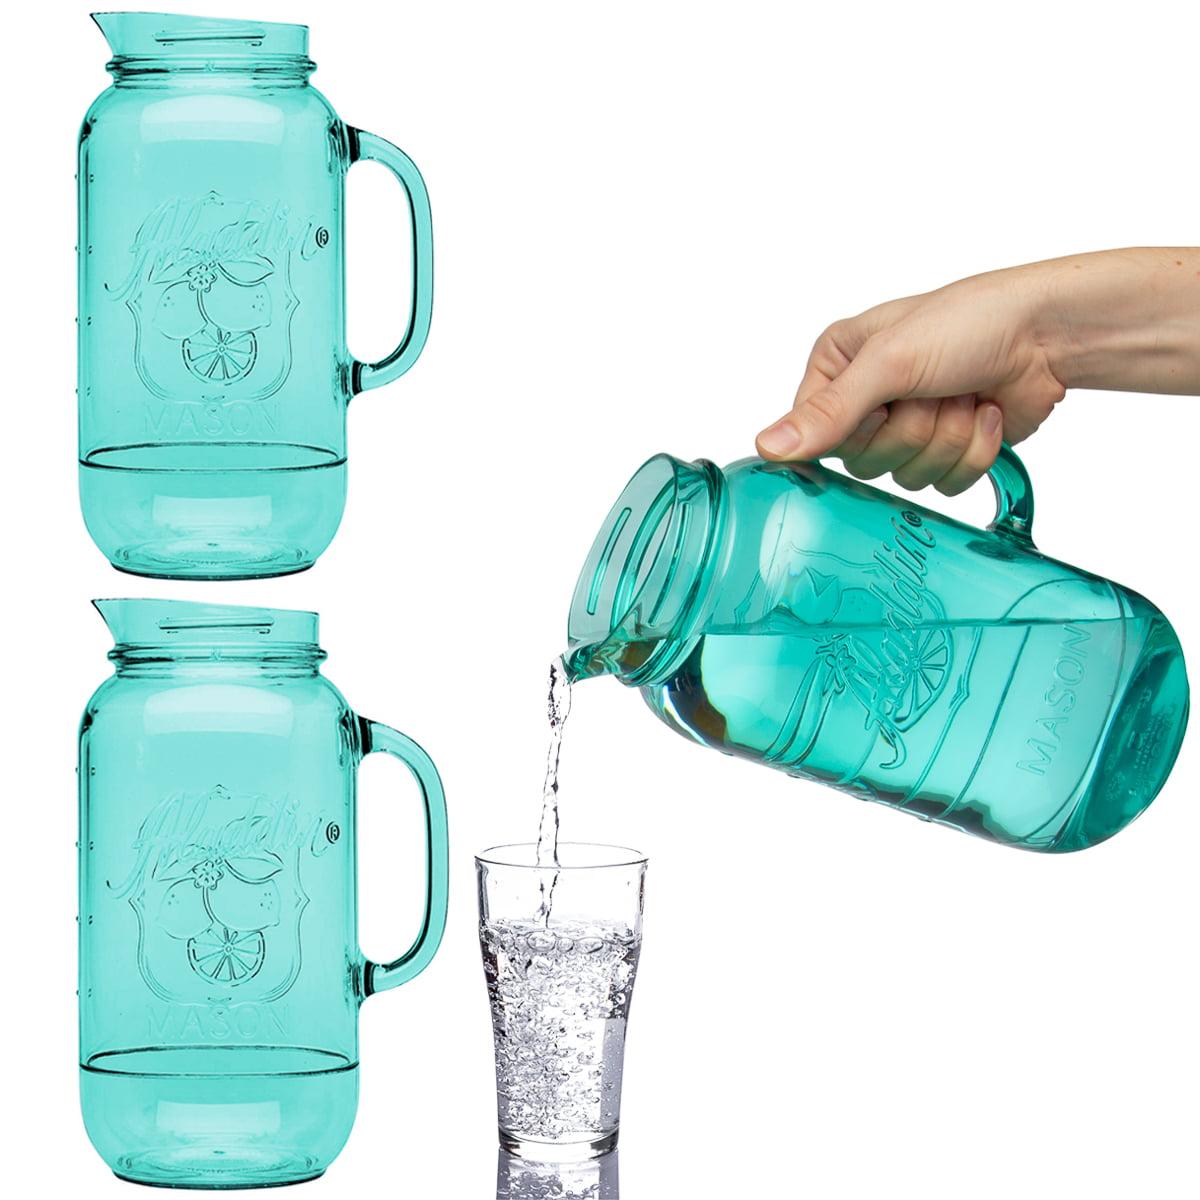 Aladdin (3 Pack) Mason Jar Plastic Drink Pitcher 2.5 Quart Water Carafe Set For Serving Juice Iced Tea... by